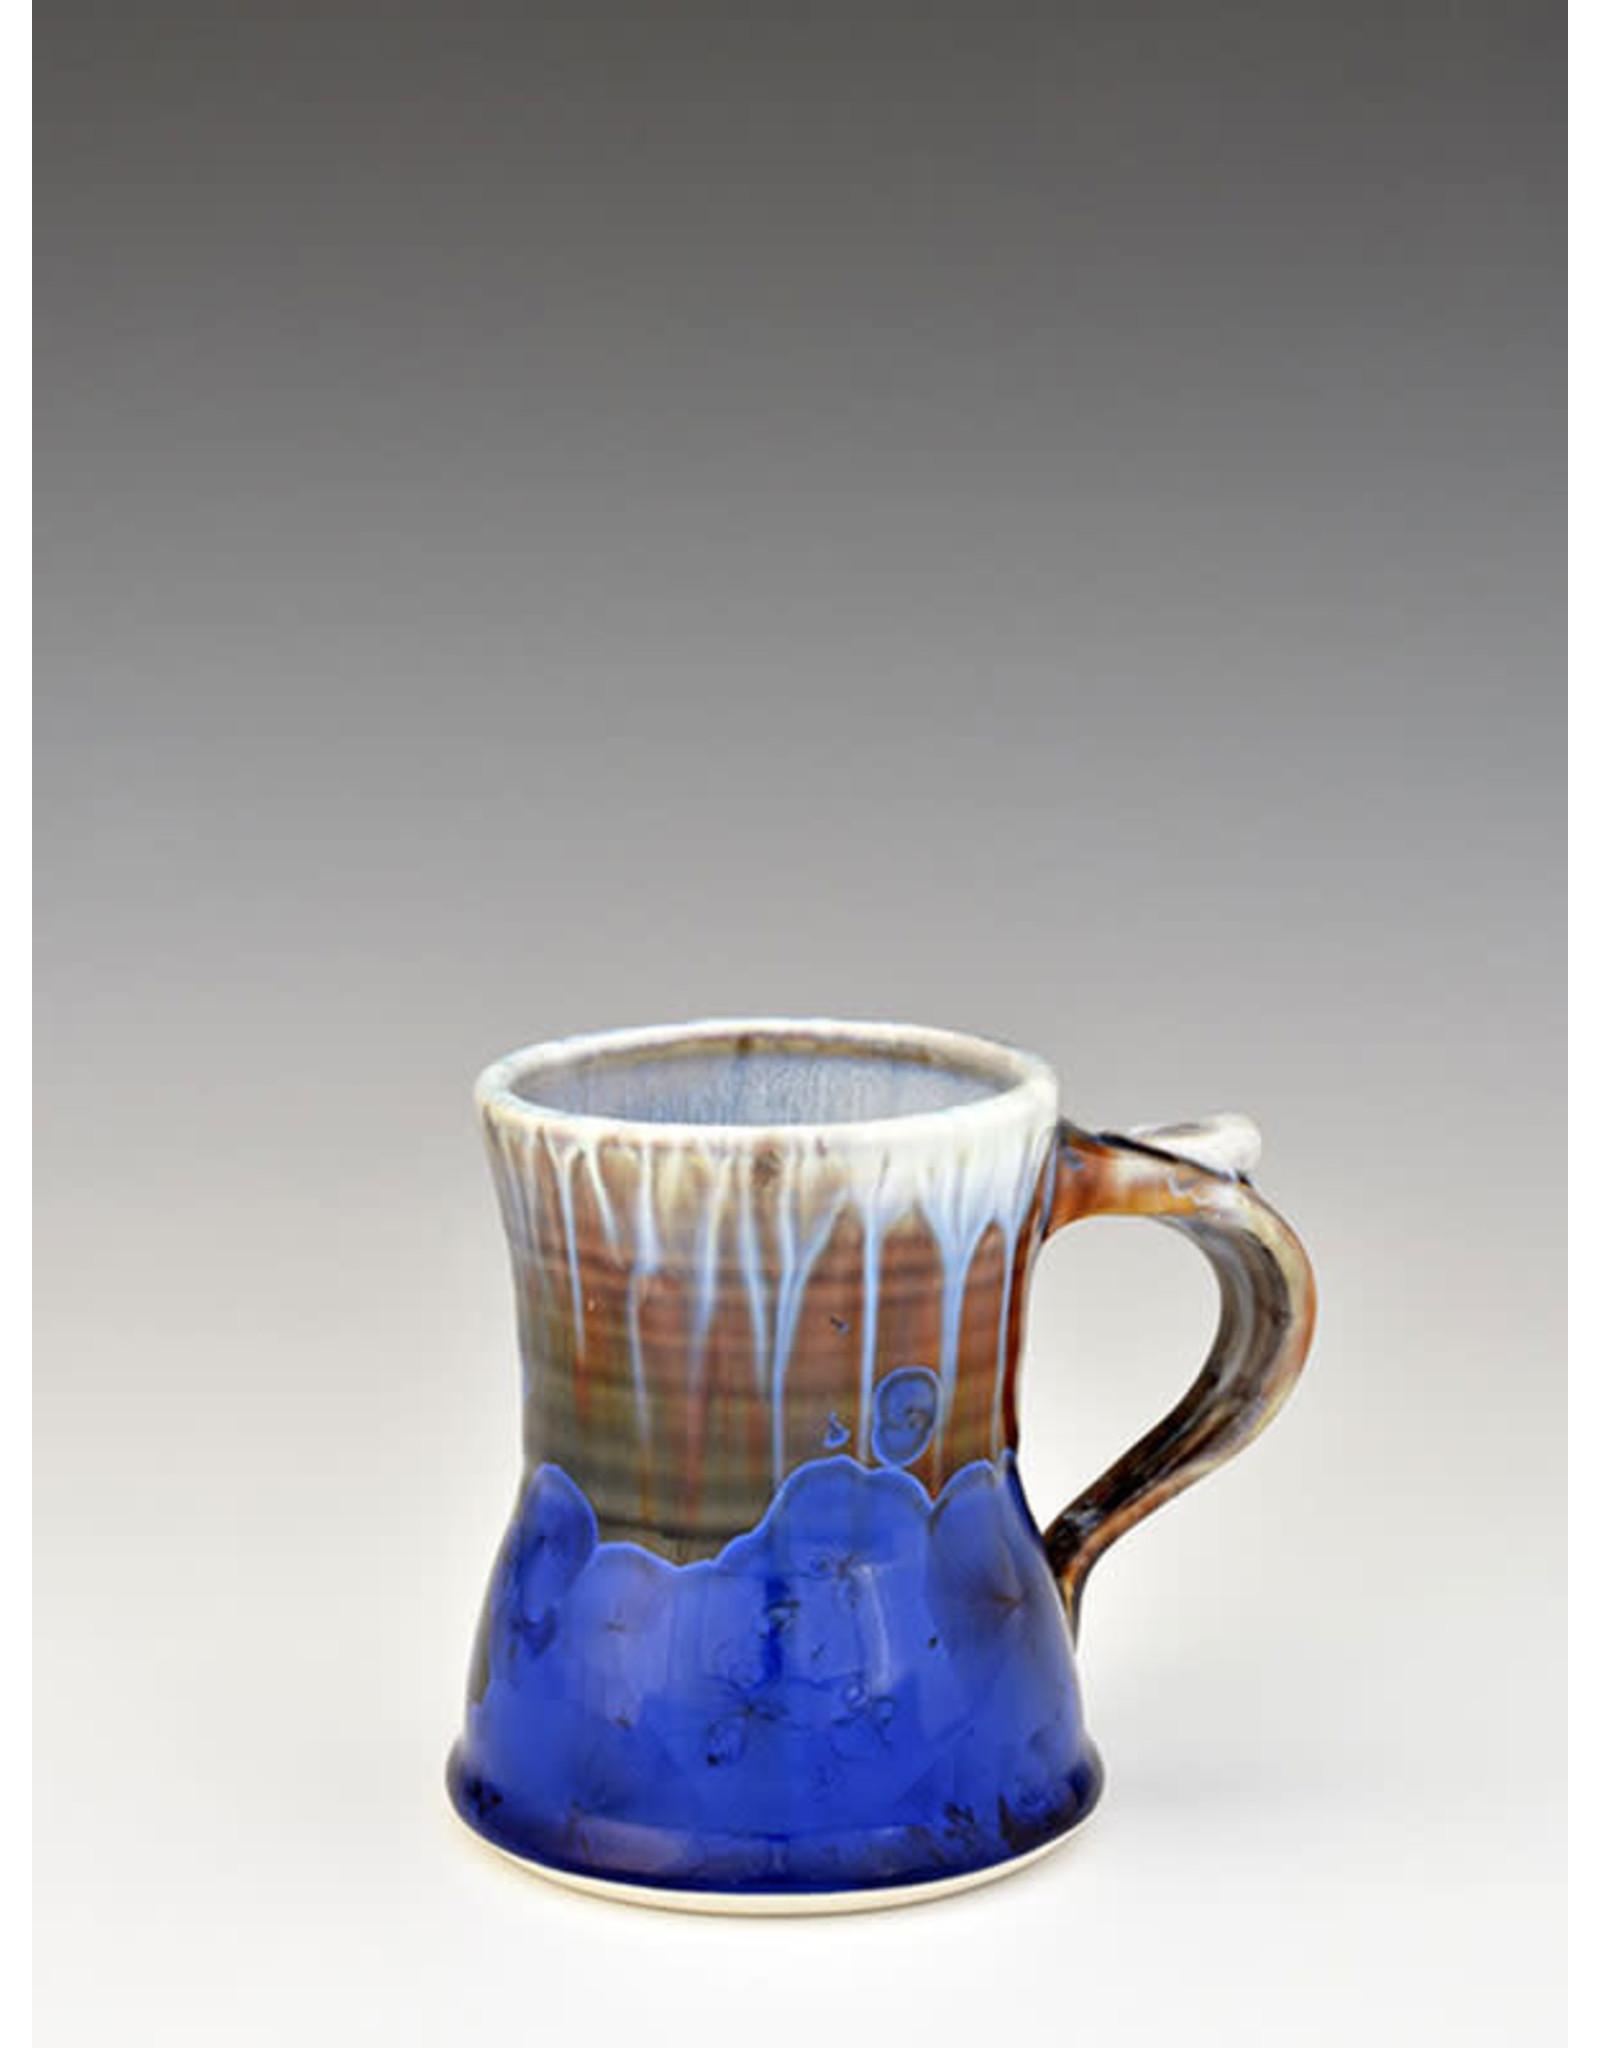 Stellar Art Pottery Stellar Art Pottery Early Morning Mug